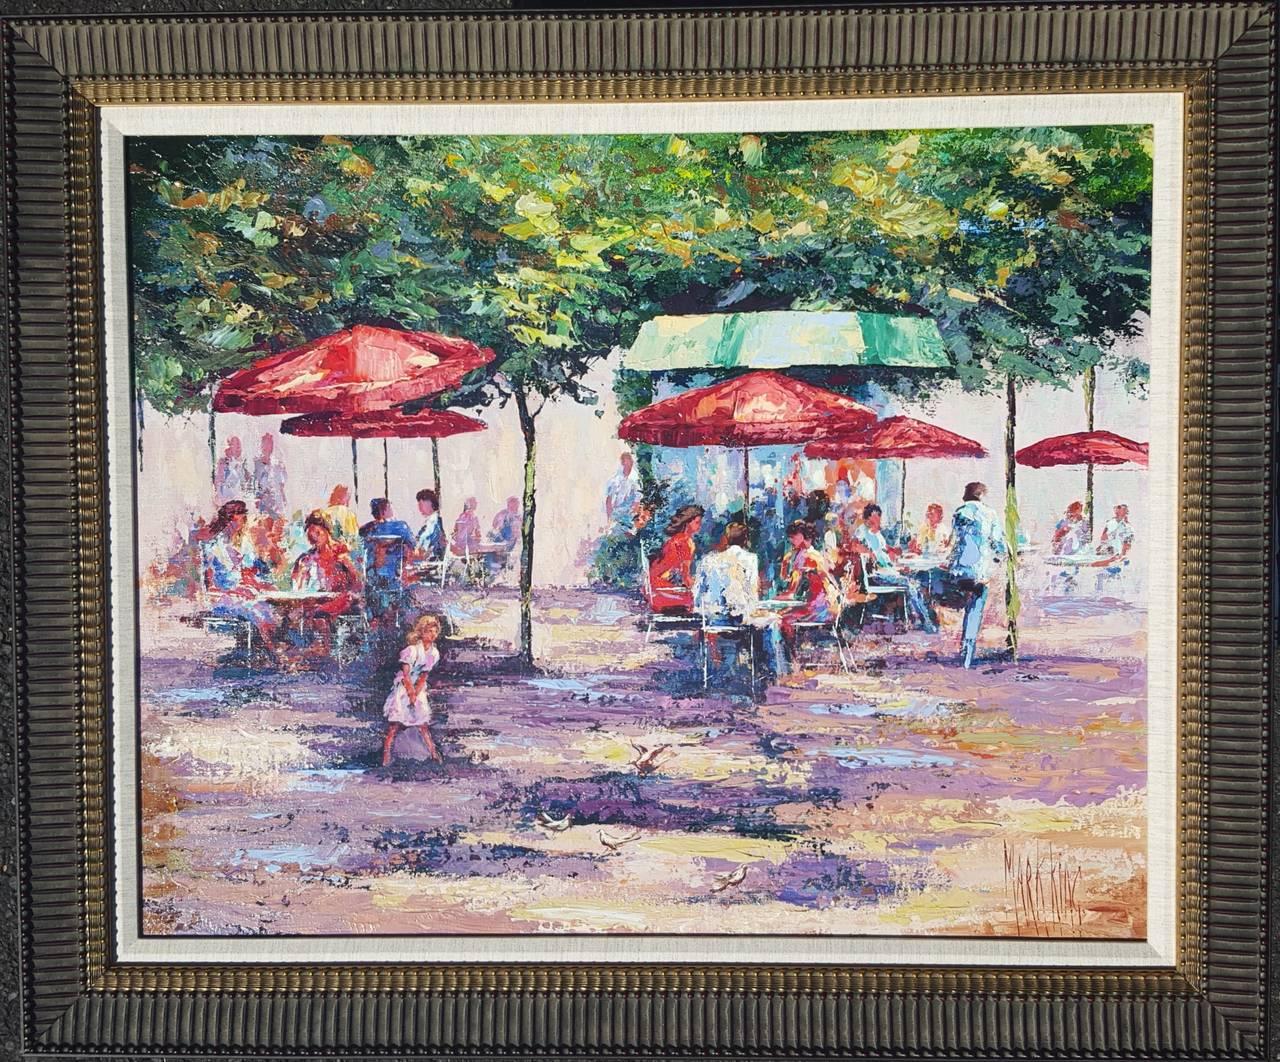 Le Cafe Dans Jardin des Tuileries - Painting by Mark King